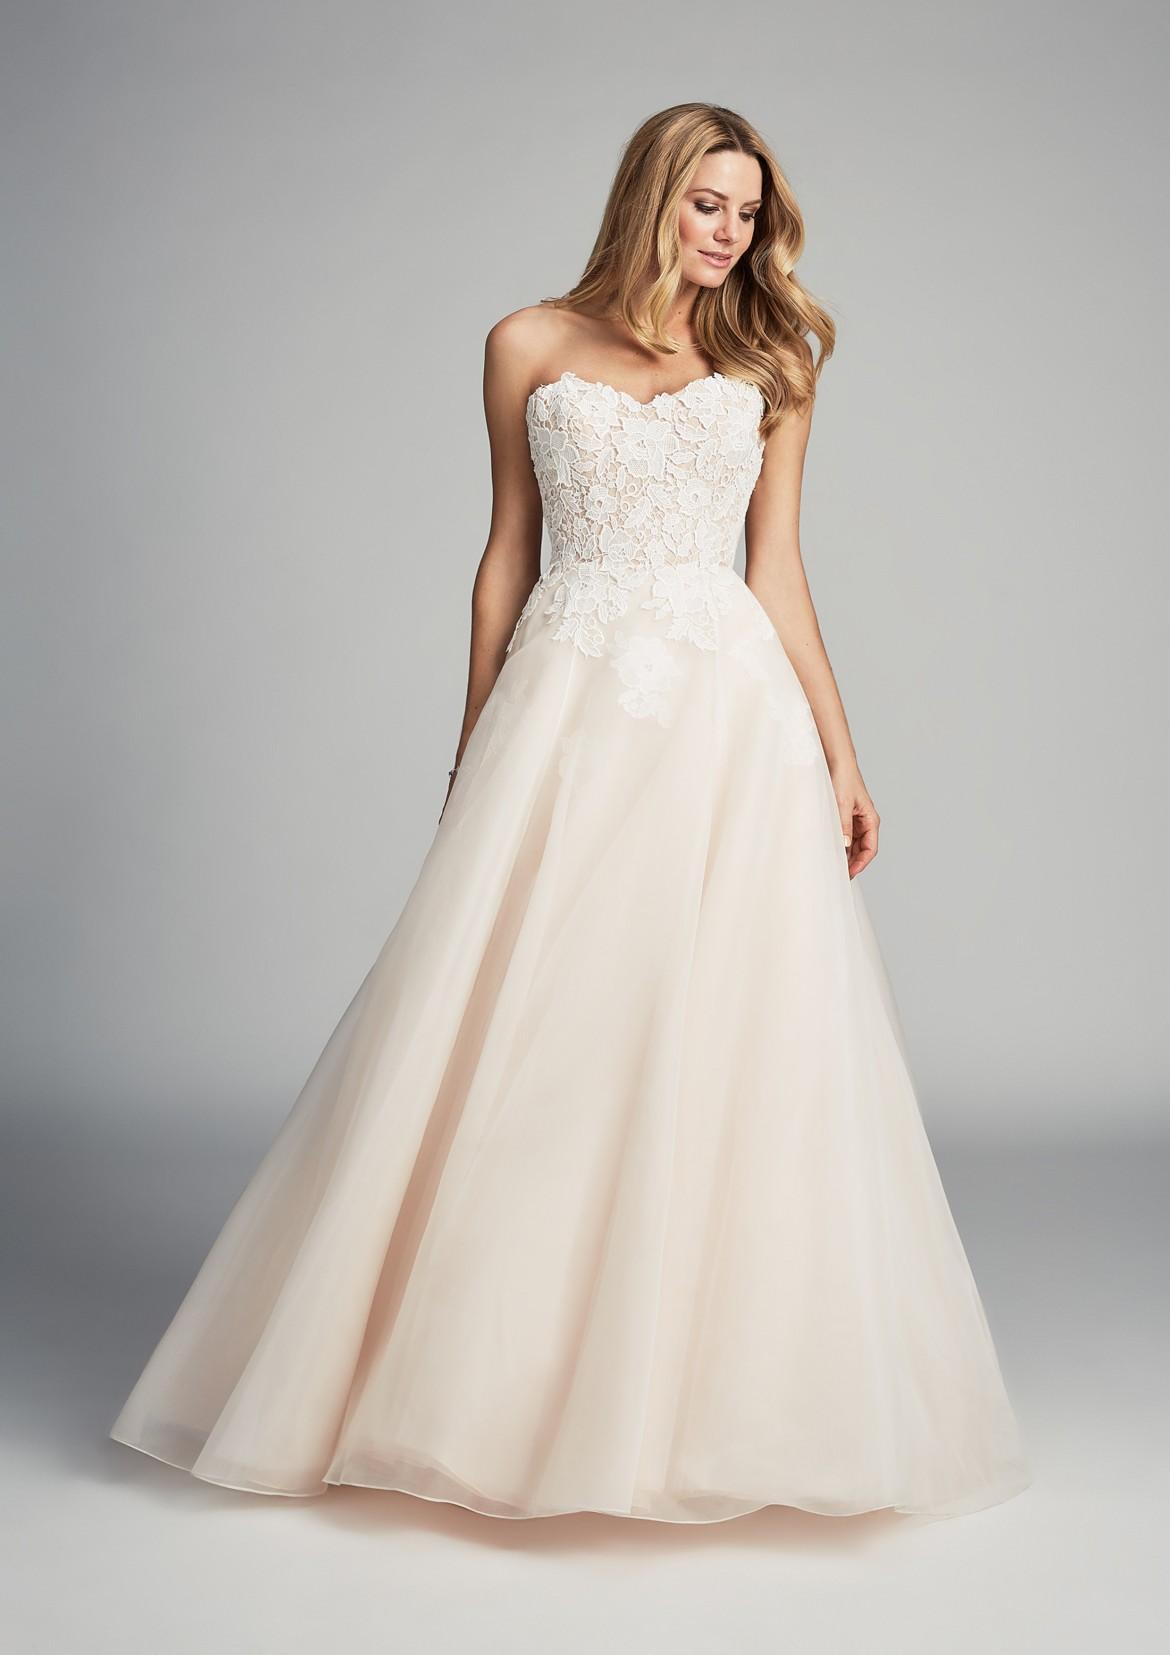 Anniversary designer wedding dress by Caroline Castigliano